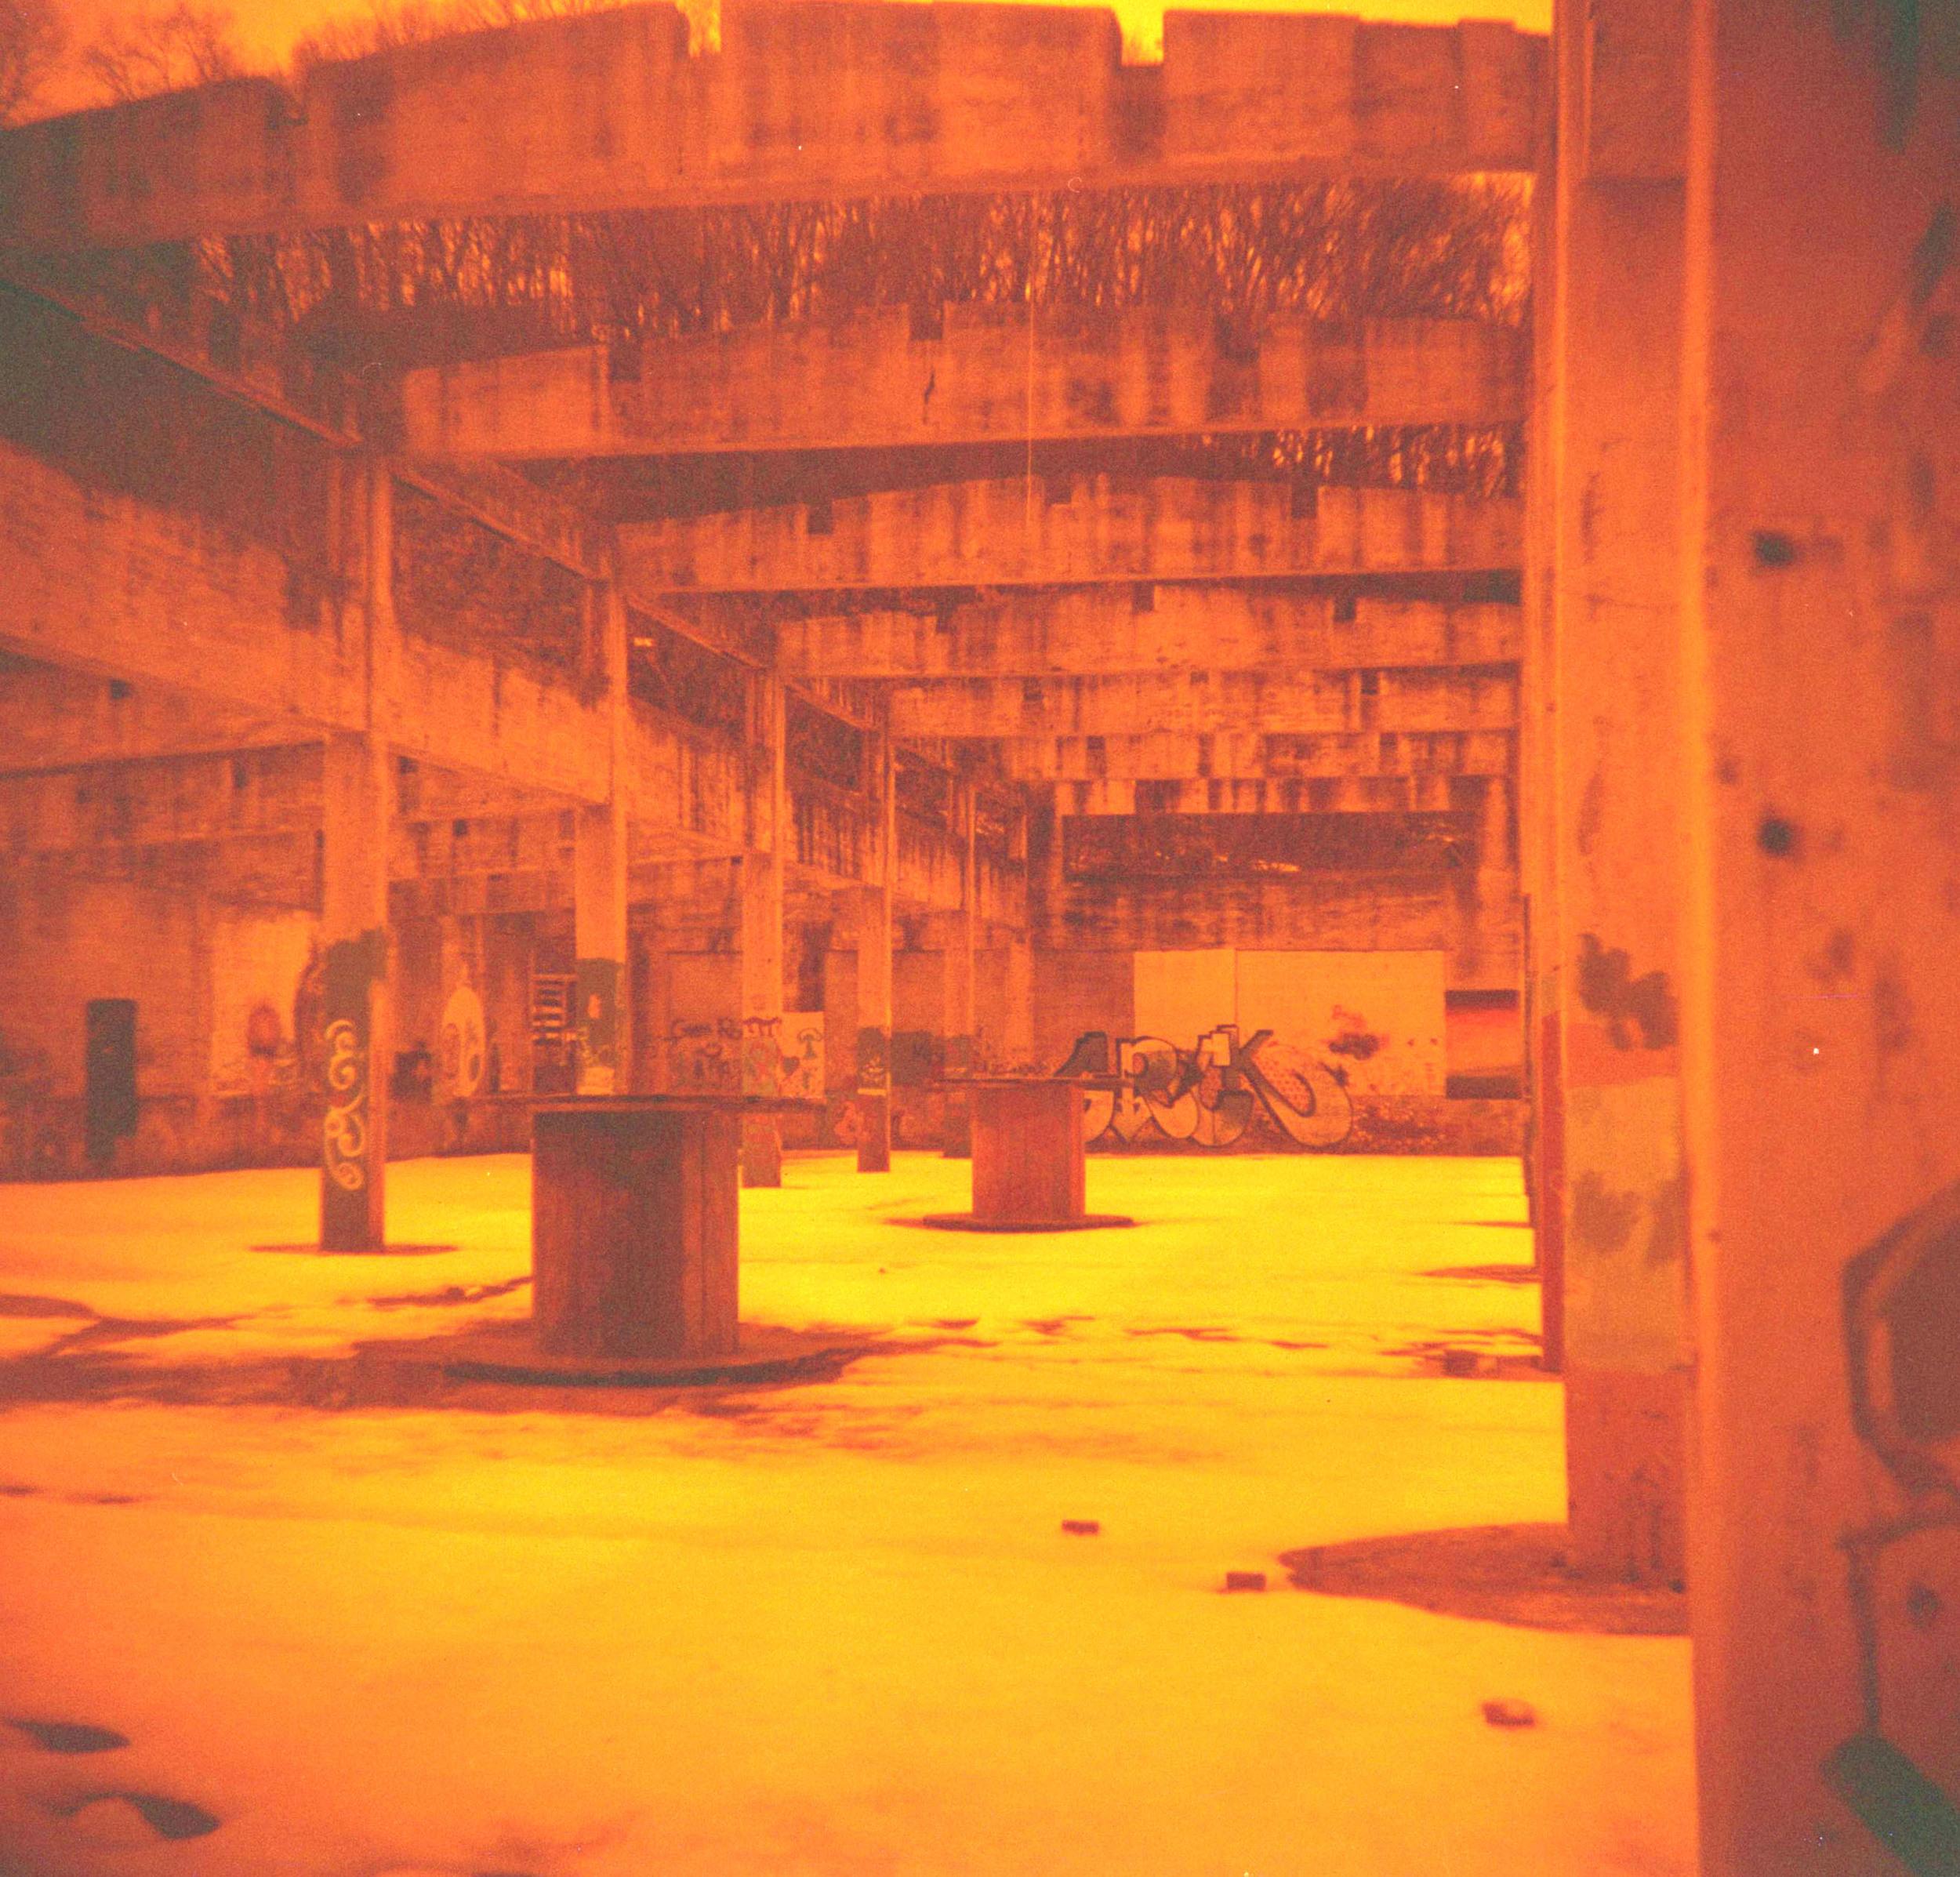 ruins_hall.jpg